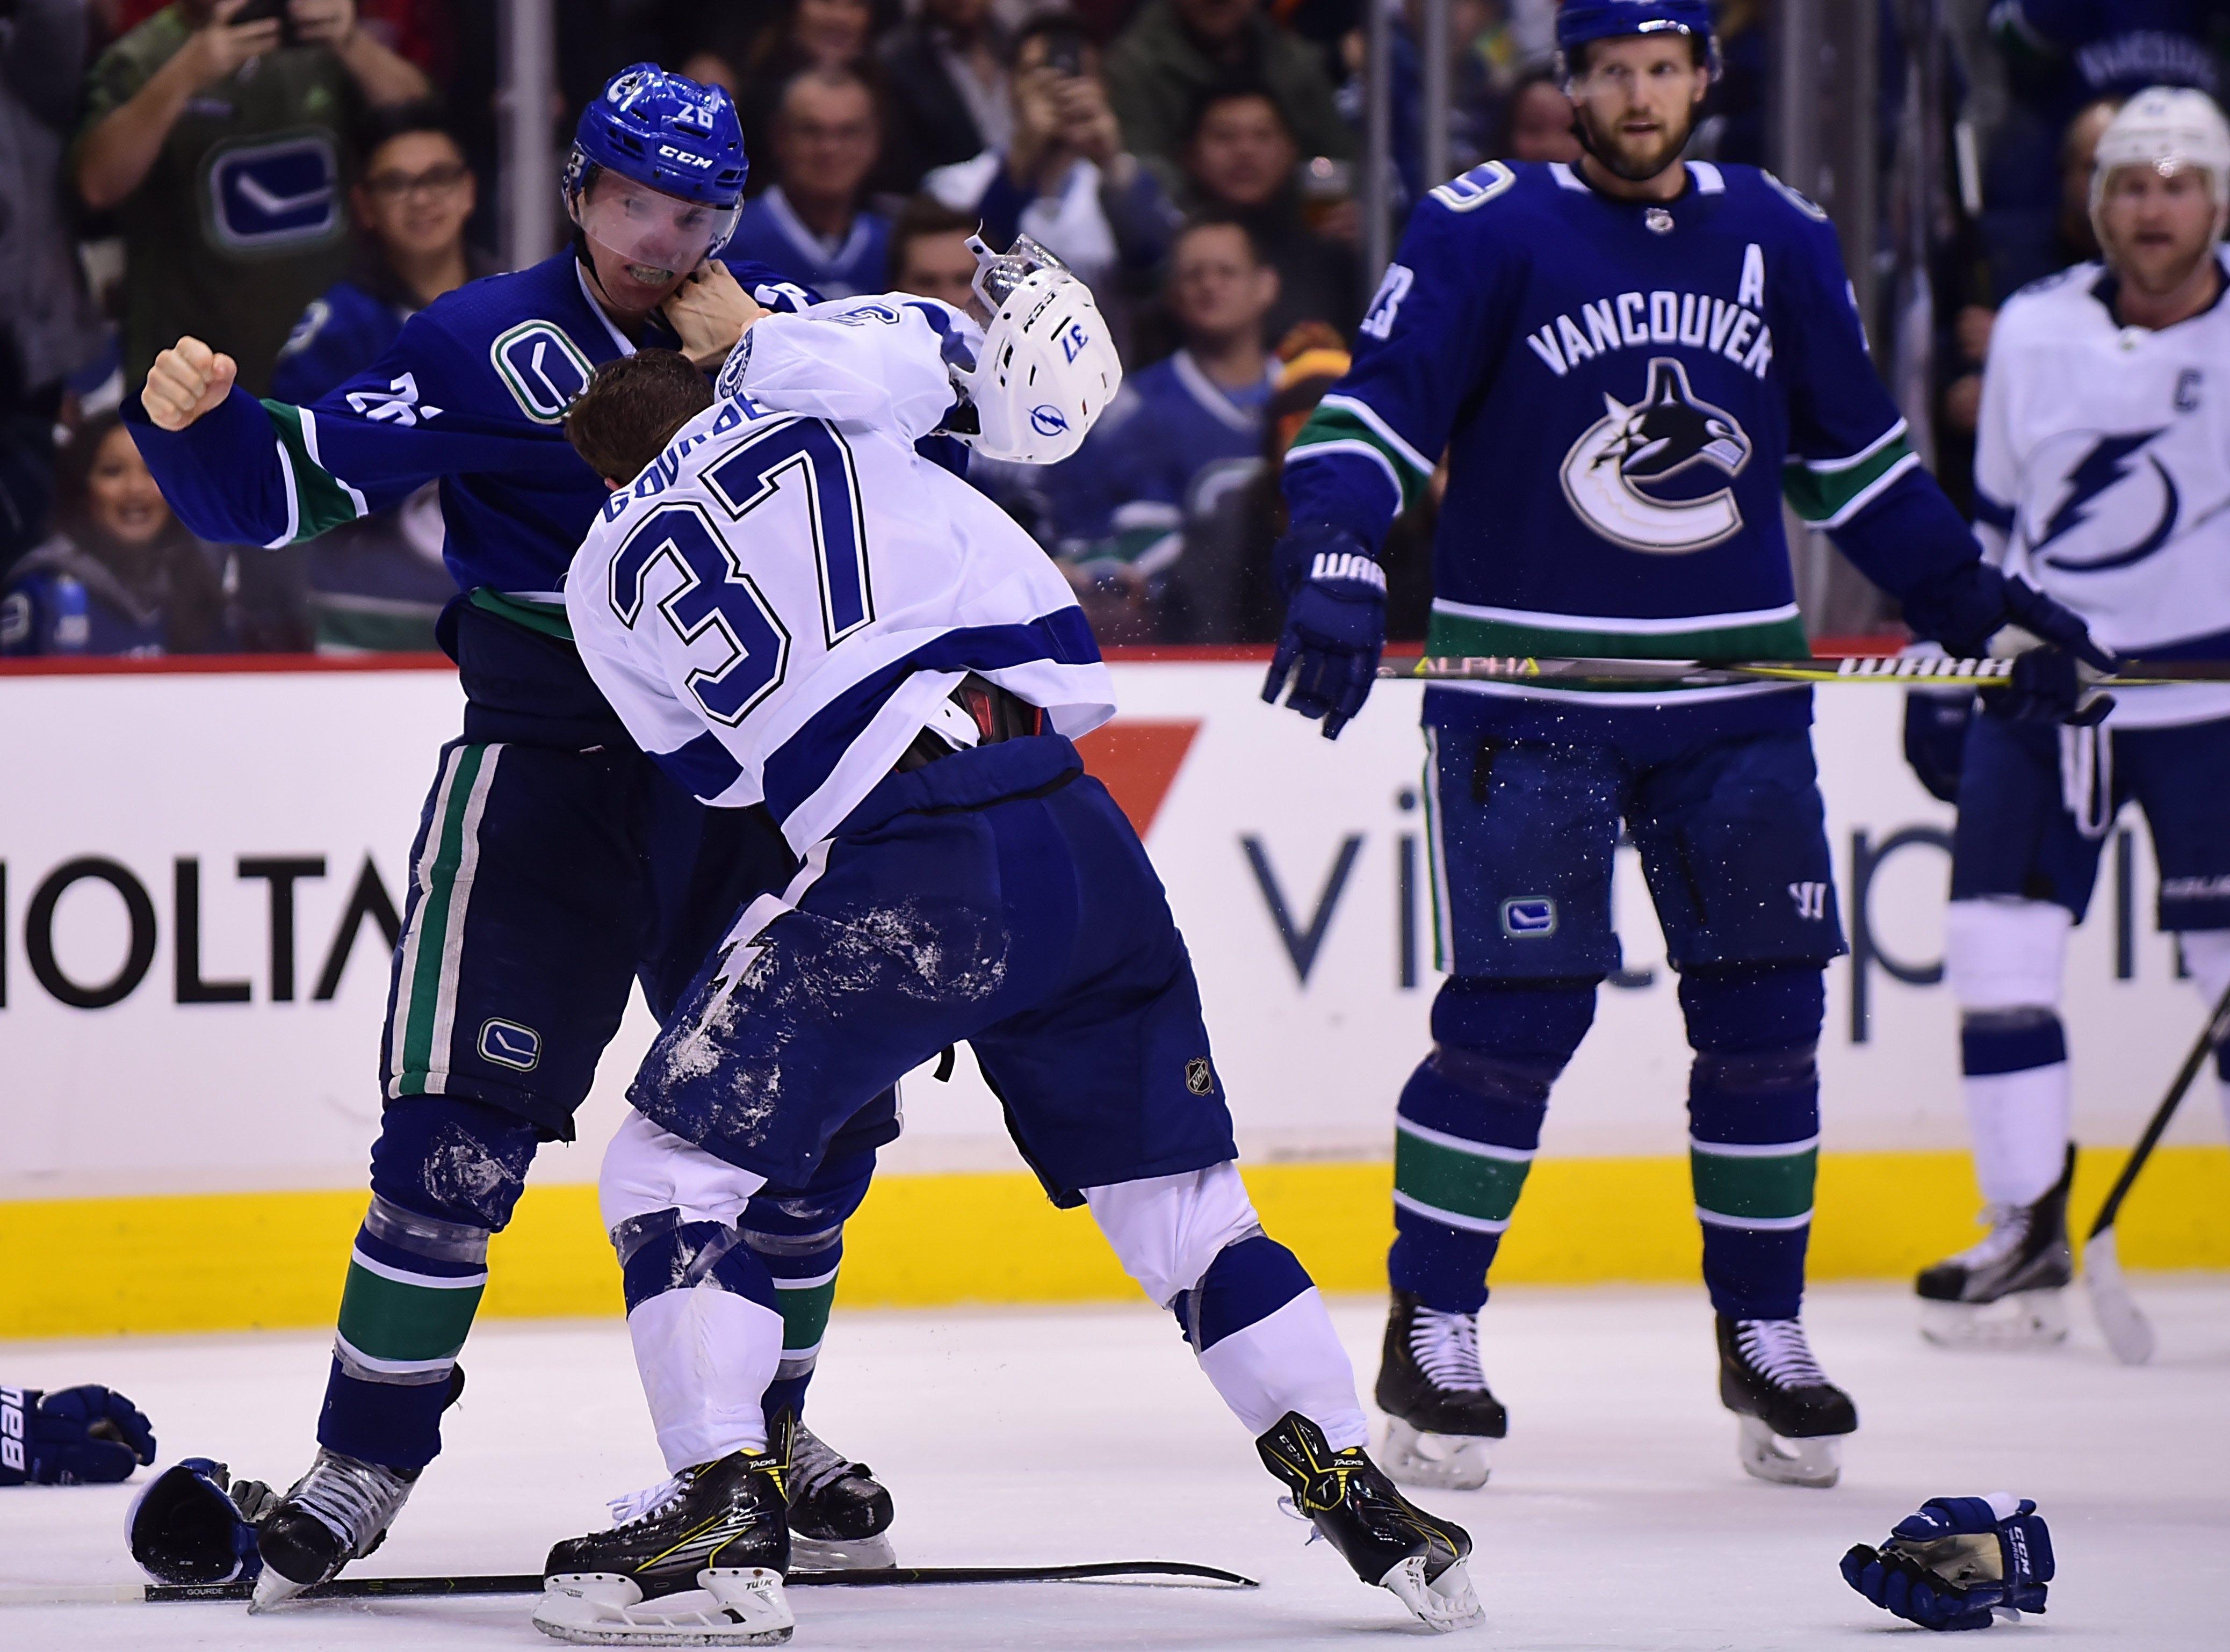 Dec. 18: Vancouver Canucks' Antoine Roussel vs. Tampa Bay Lightning's Yanni Gourde.